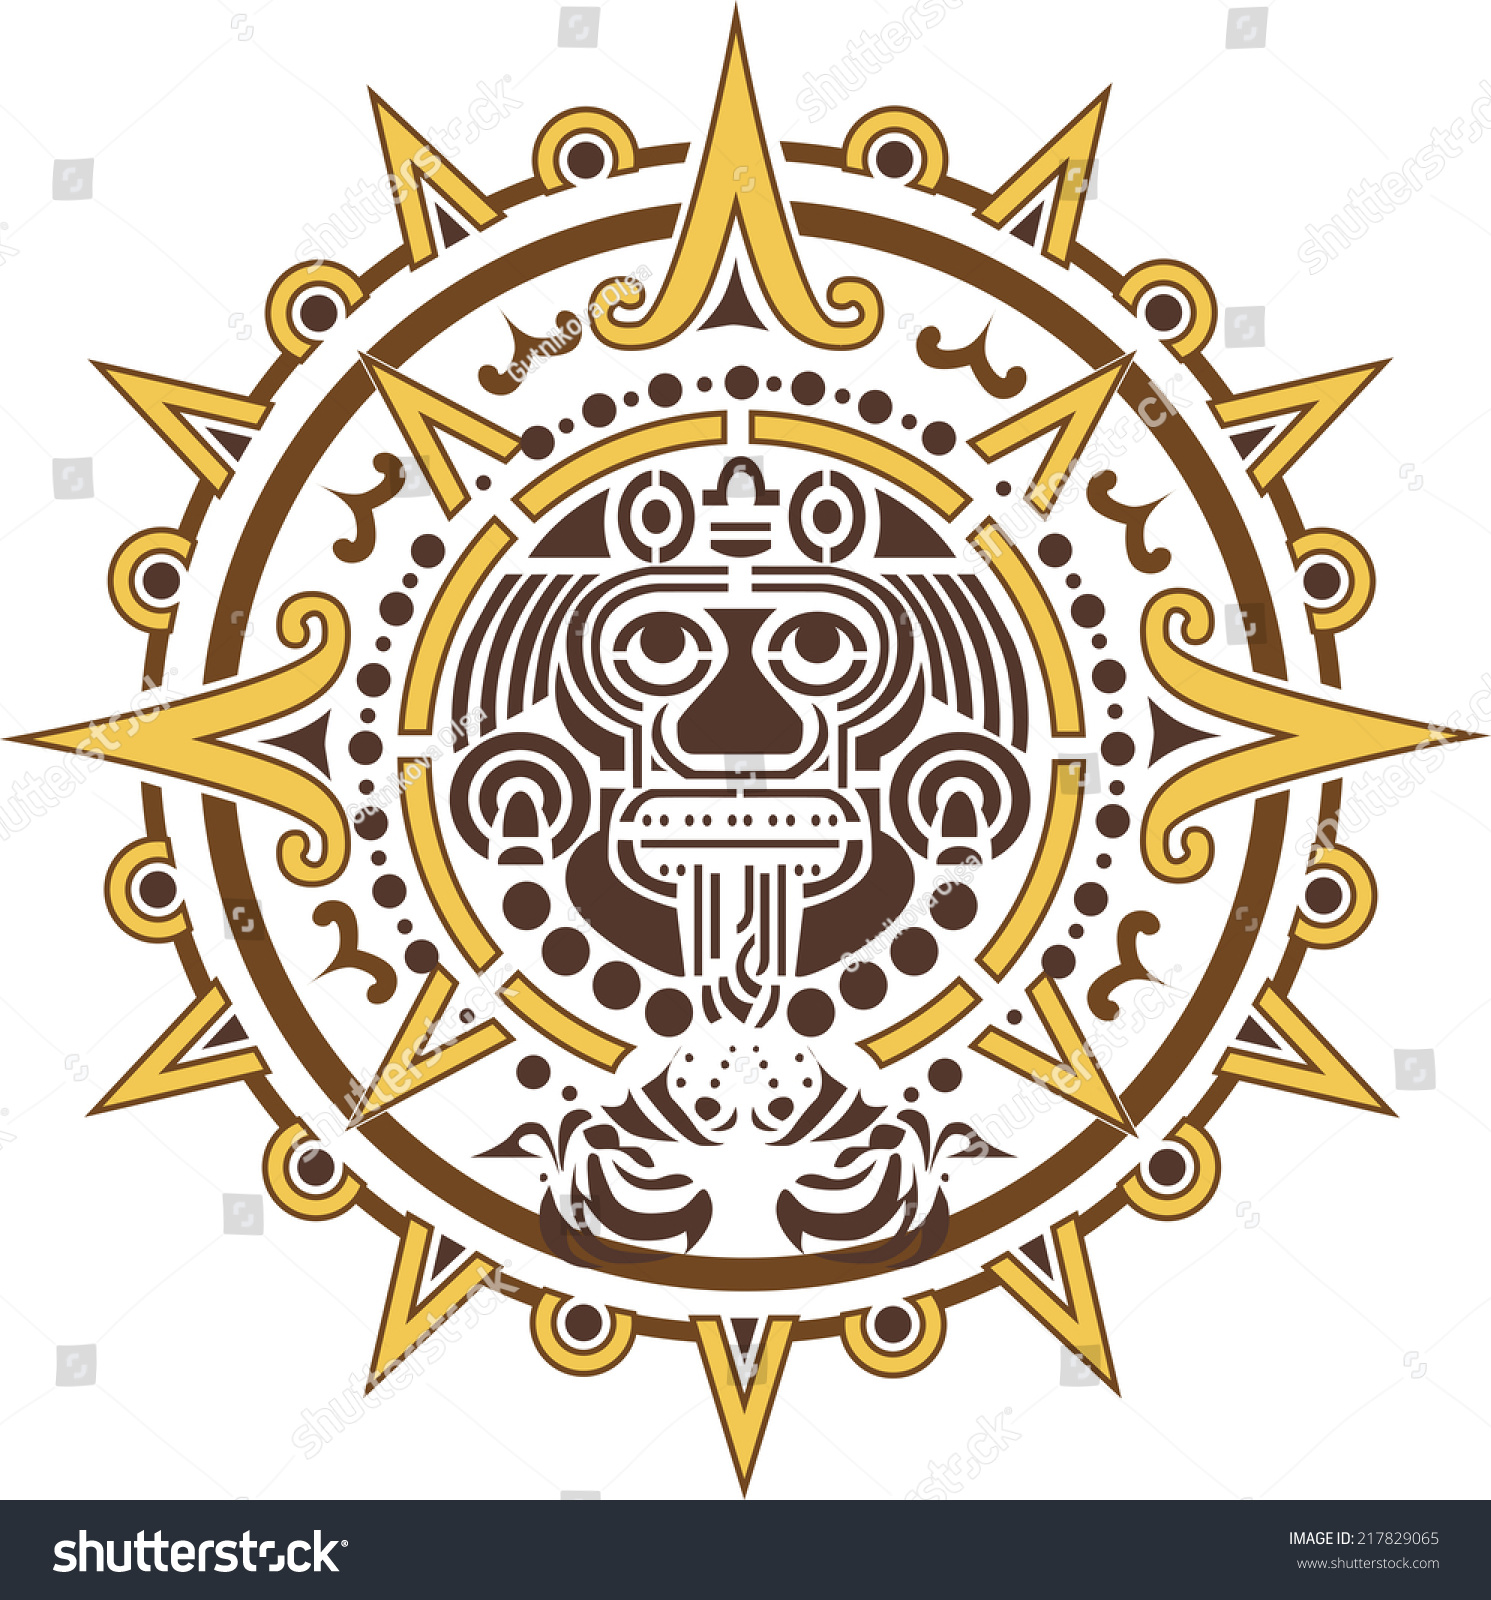 Aztec sun logo ethnic symbol stock vector 217829065 shutterstock aztec sun logo ethnic symbol biocorpaavc Gallery